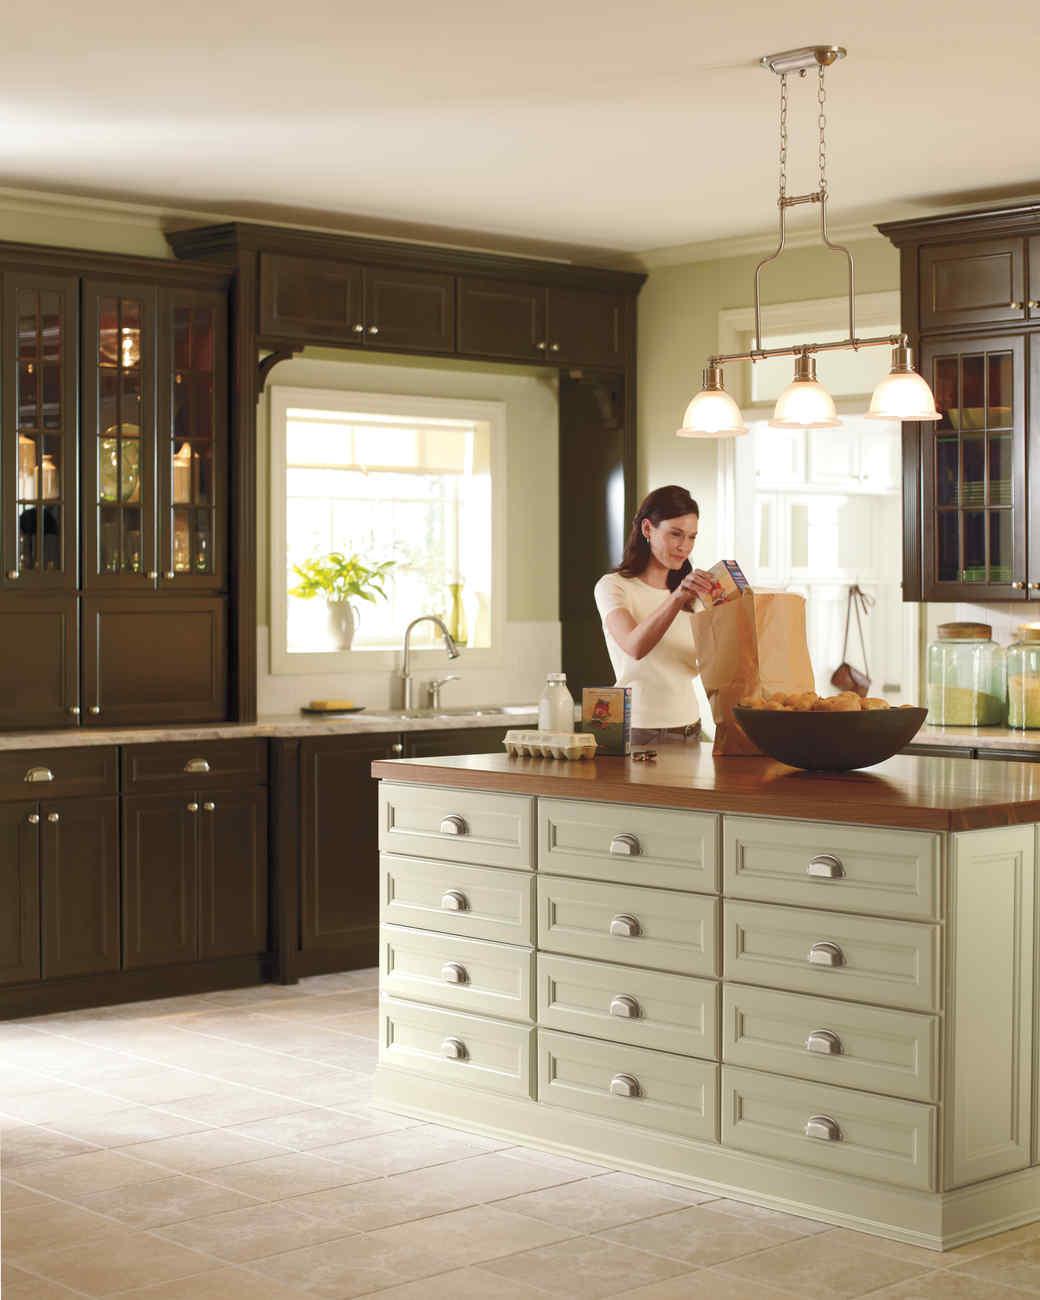 Peek Inside Marthau0027s Kitchens (and Steal The Looks For Your Home) | Martha  Stewart